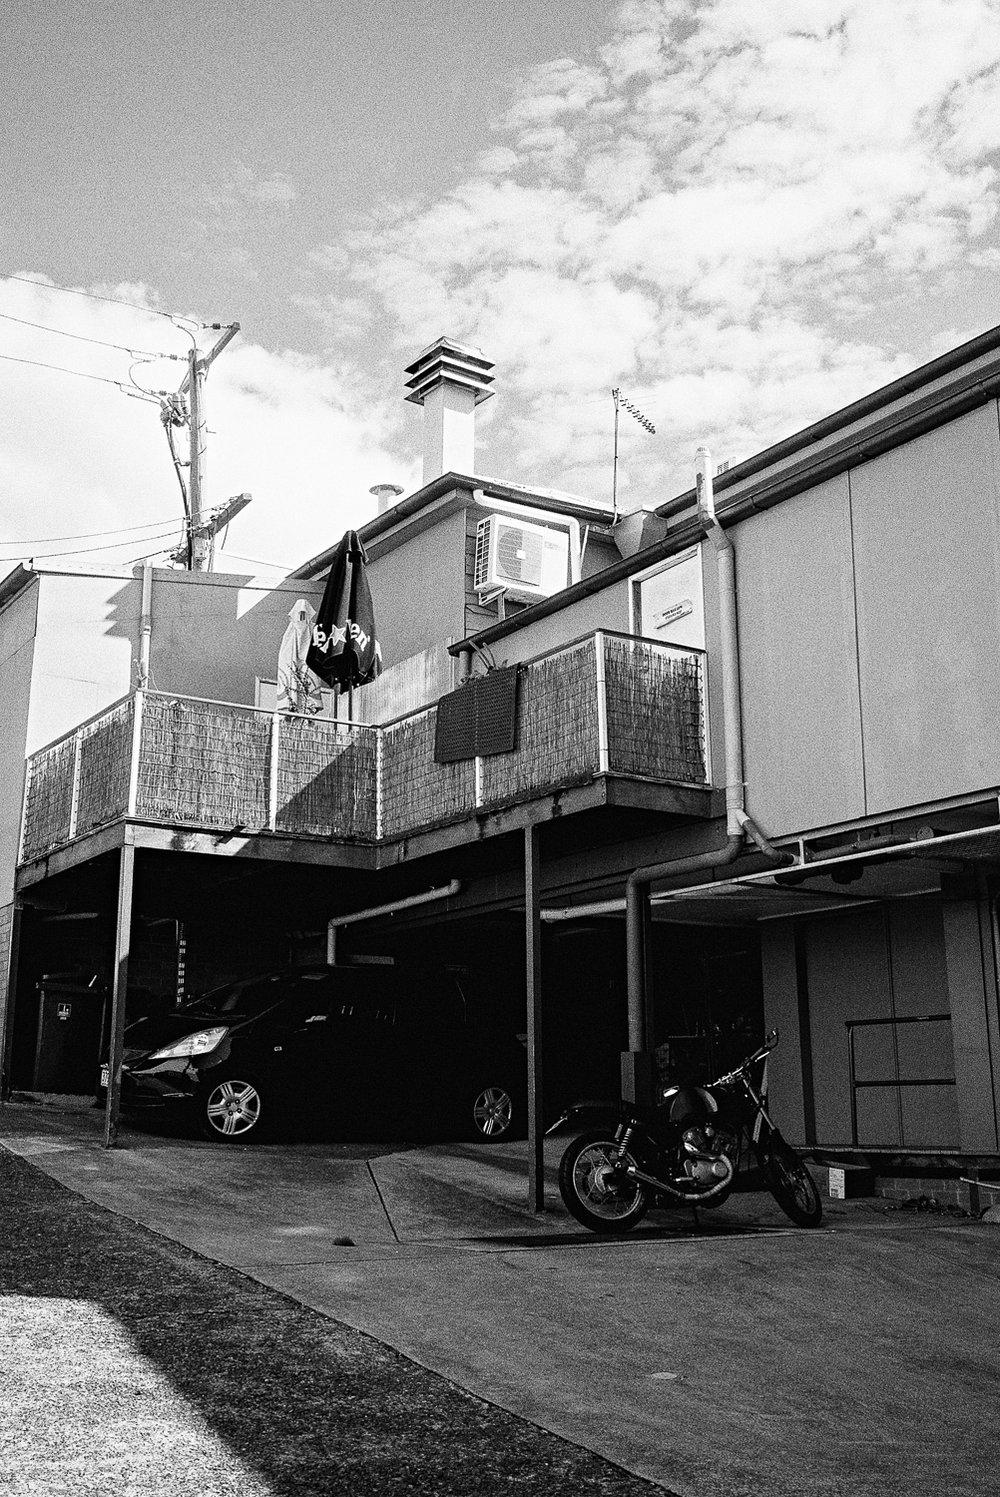 20170715_TylerAlbertiWorkshop_021939_Edit-Nick-Bedford,-Photographer-Black and White, Leica M Typ 240, Photo Shoot, Portrait, Street Photography, Studio, Voigtlander 35mm F1.7 Ultron Asph, VSCO Film, Workshop.jpg